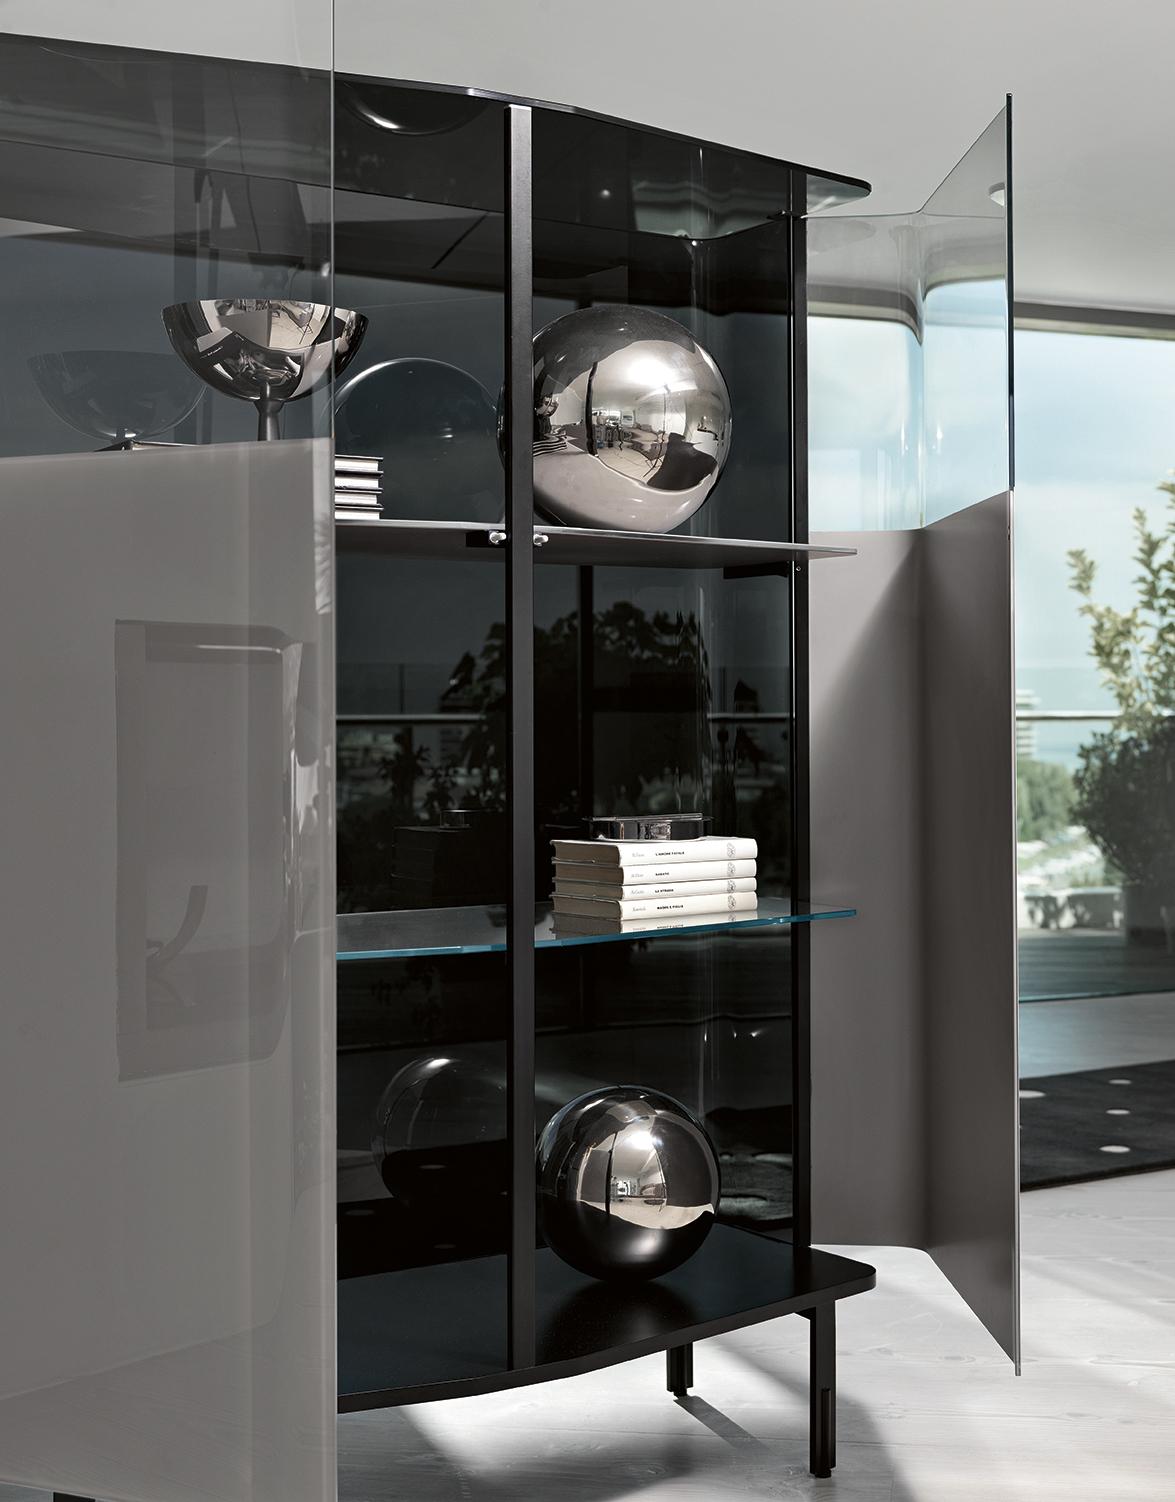 10_plie-cabinet-studio-klass-fiam-2016